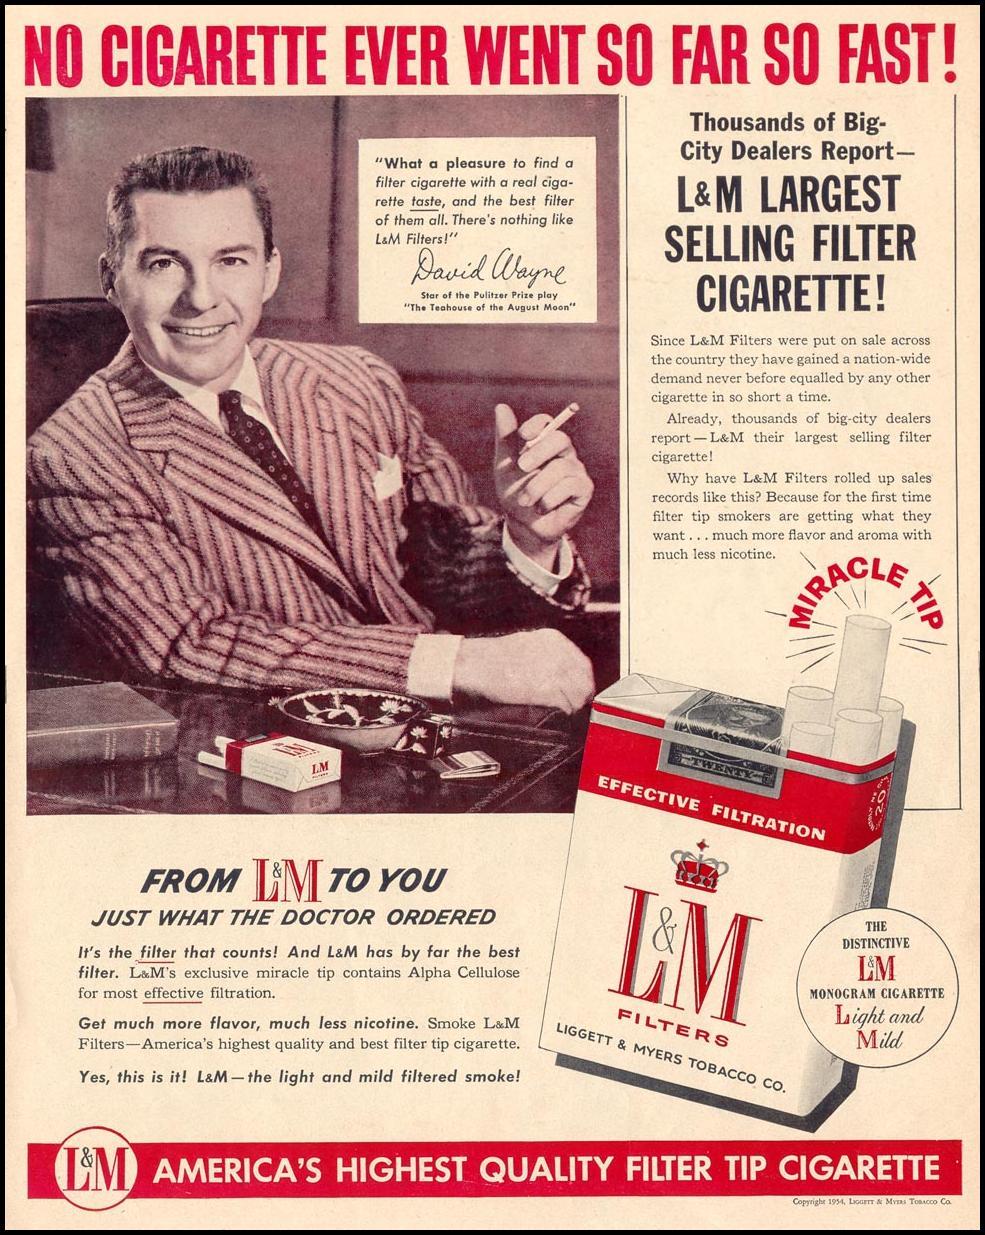 L & M CIGARETTES LIFE 07/12/1954 p. 41